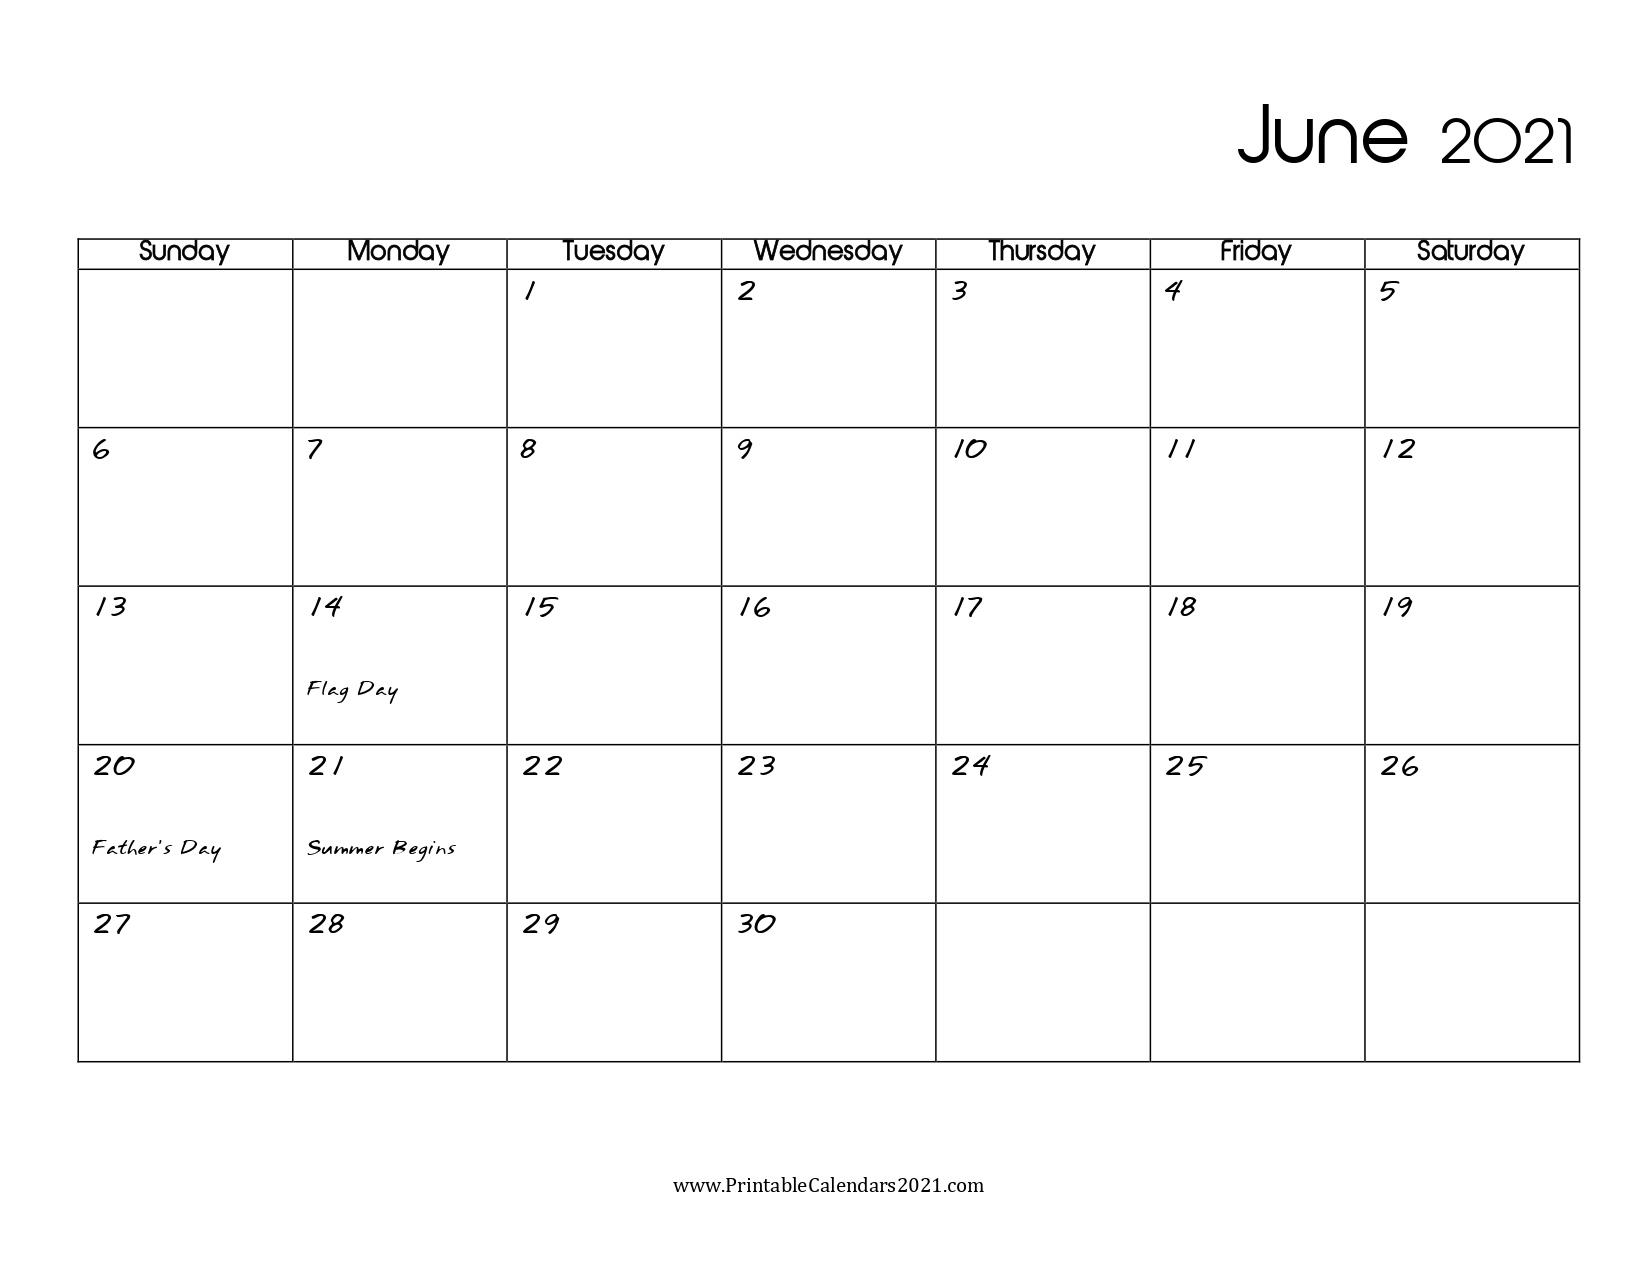 60+ Free June 2021 Calendar Printable With Holidays, Blank, Pdf June 2021 Calendar Blank